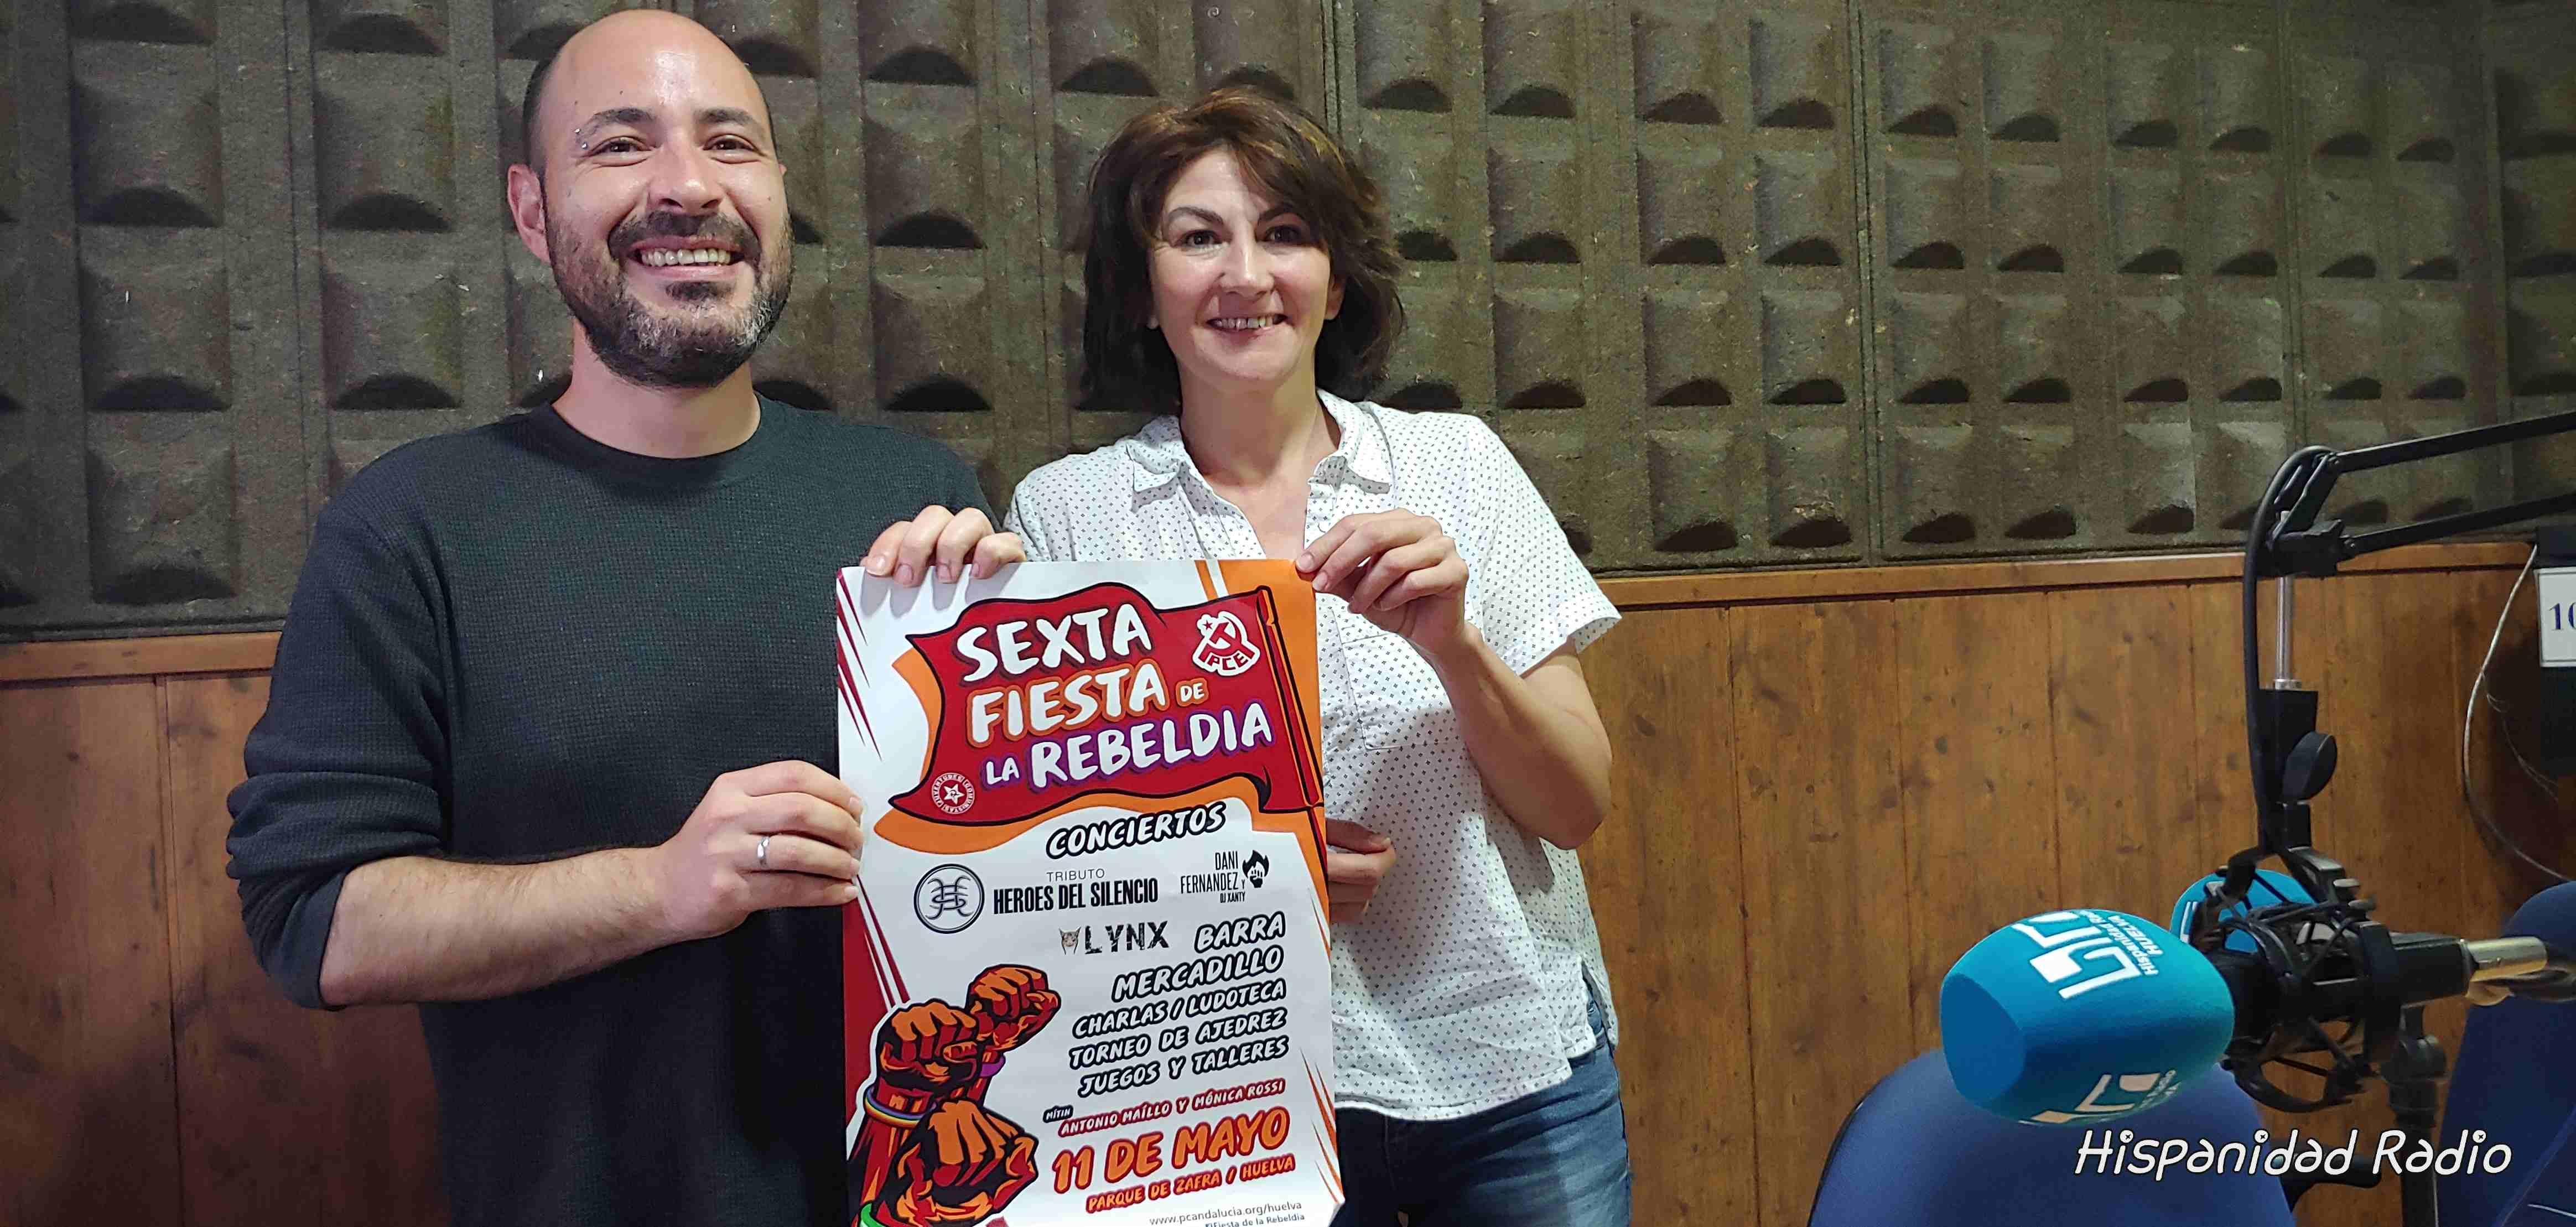 Queremos Saber 03-05-2019 PCA -Fiesta de la Reberdia